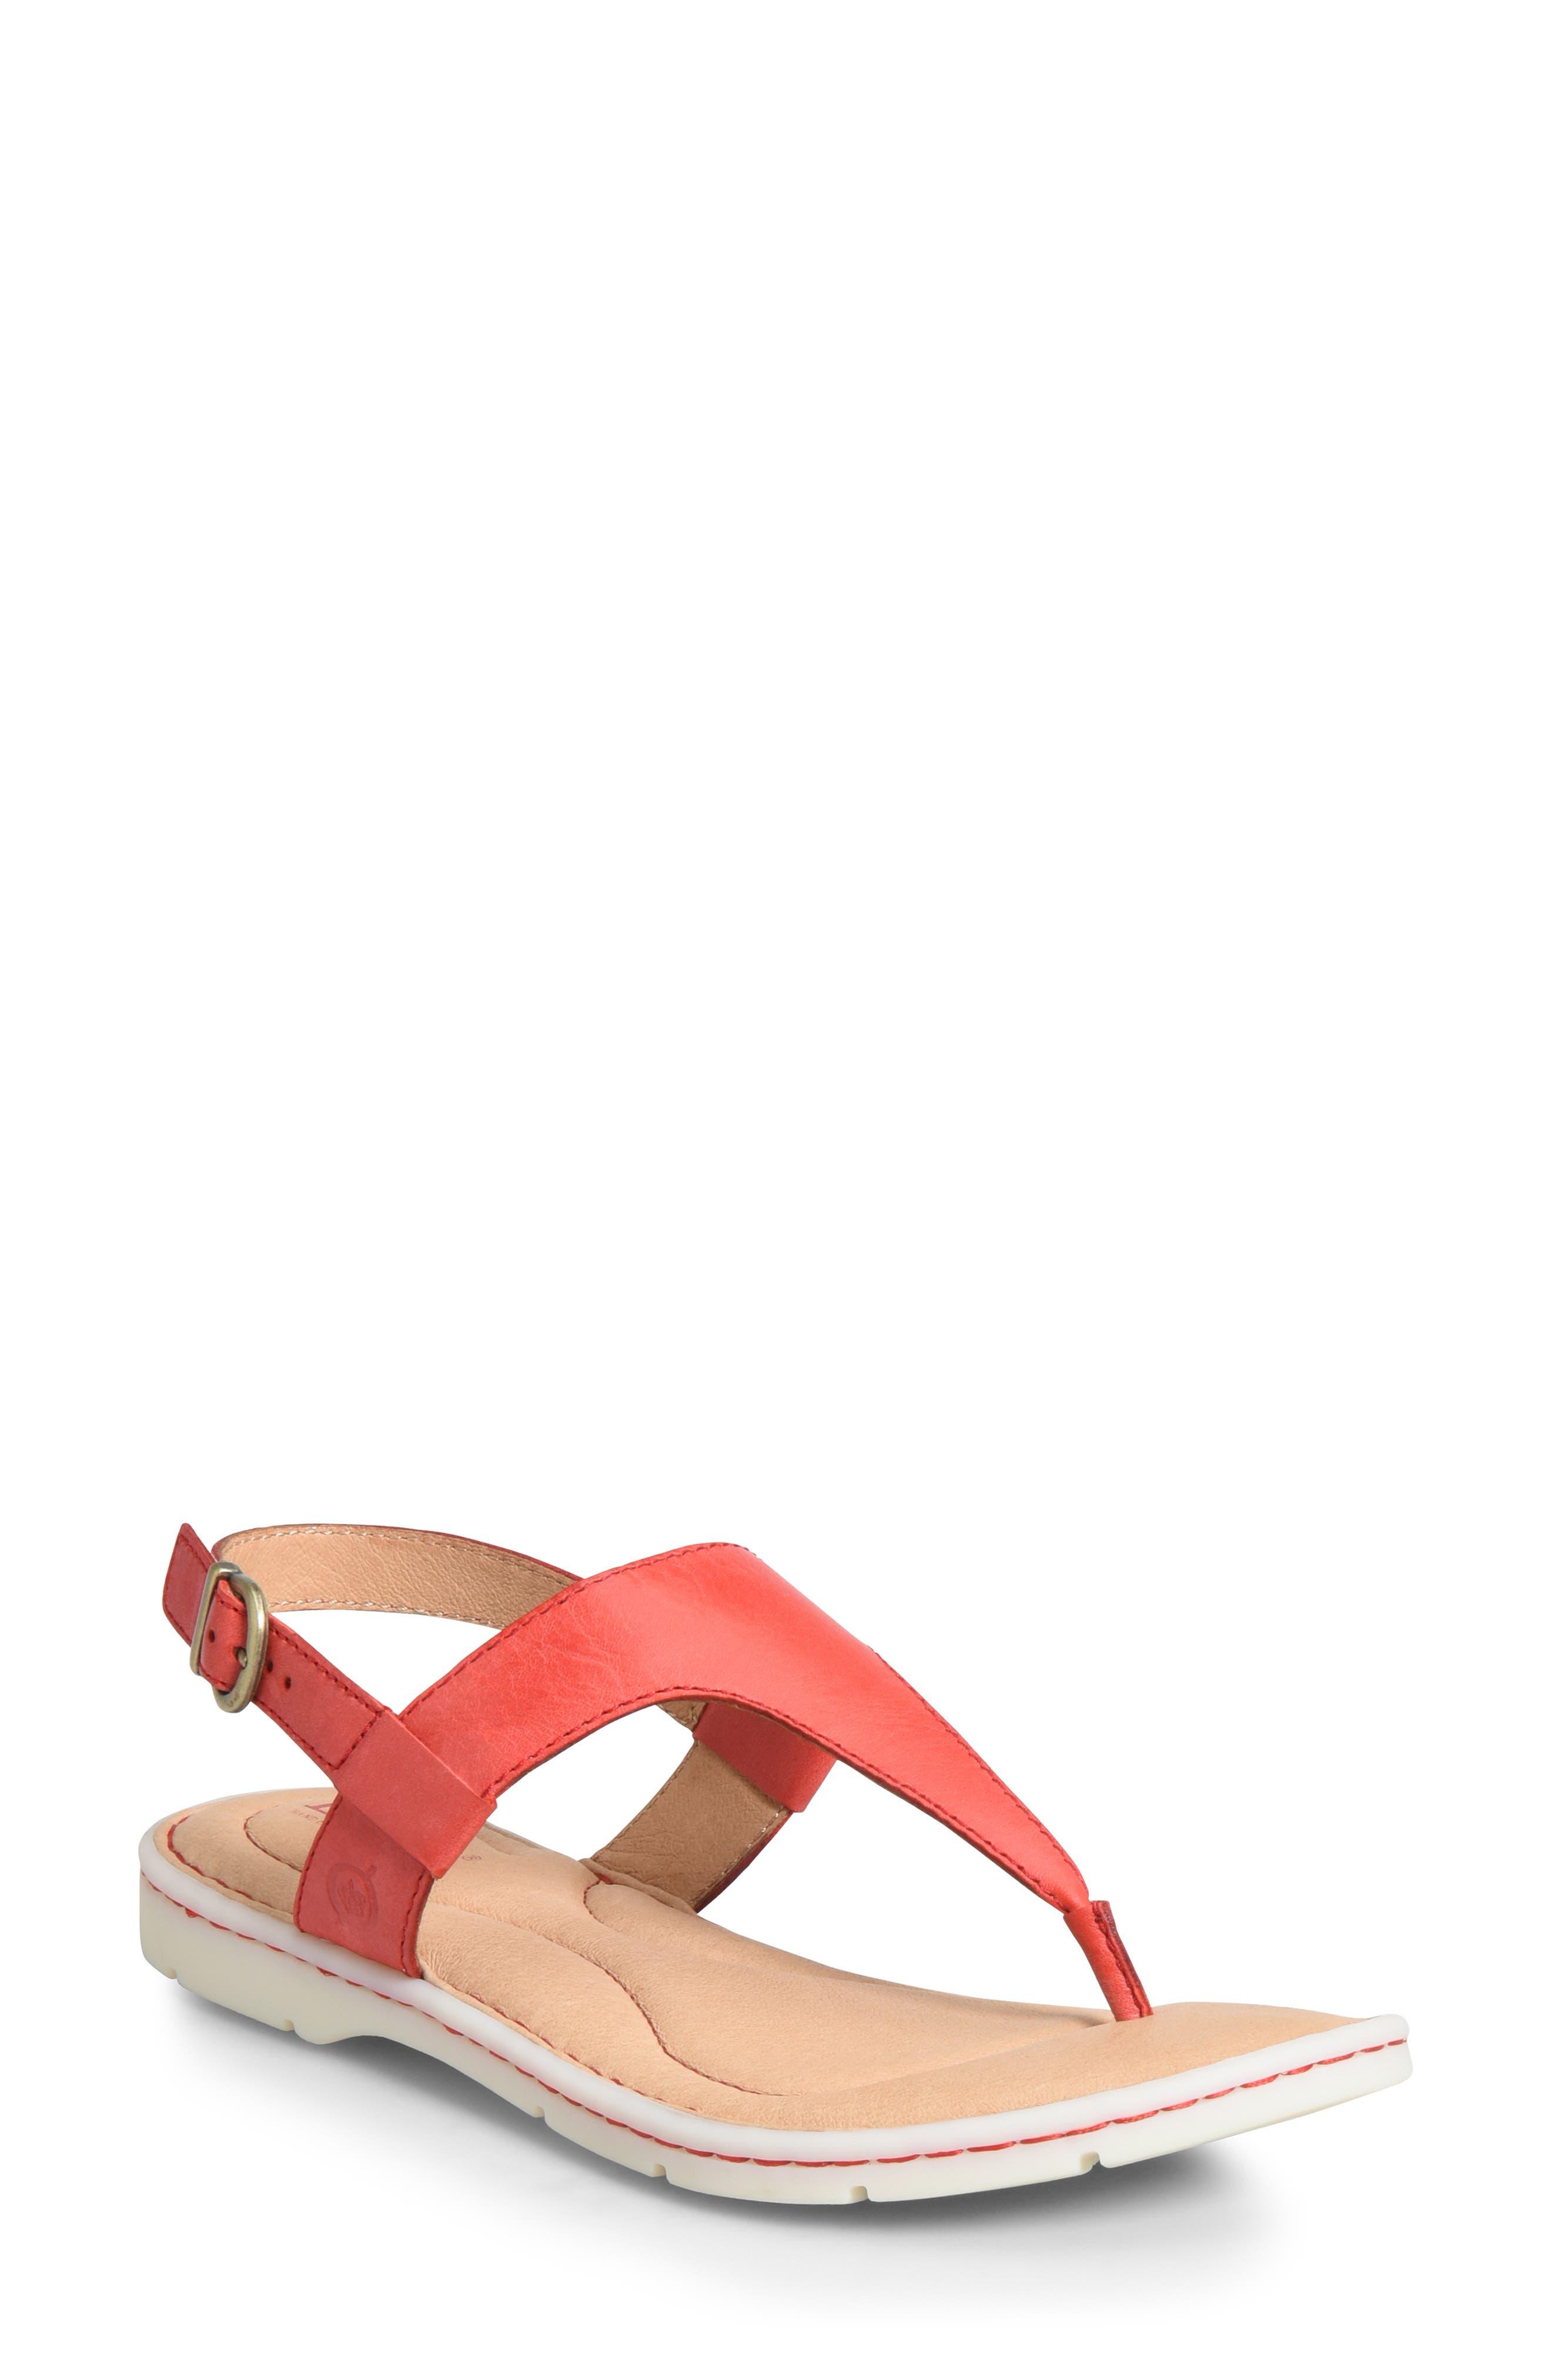 B?rn Taylor V-Strap Sandal, Red